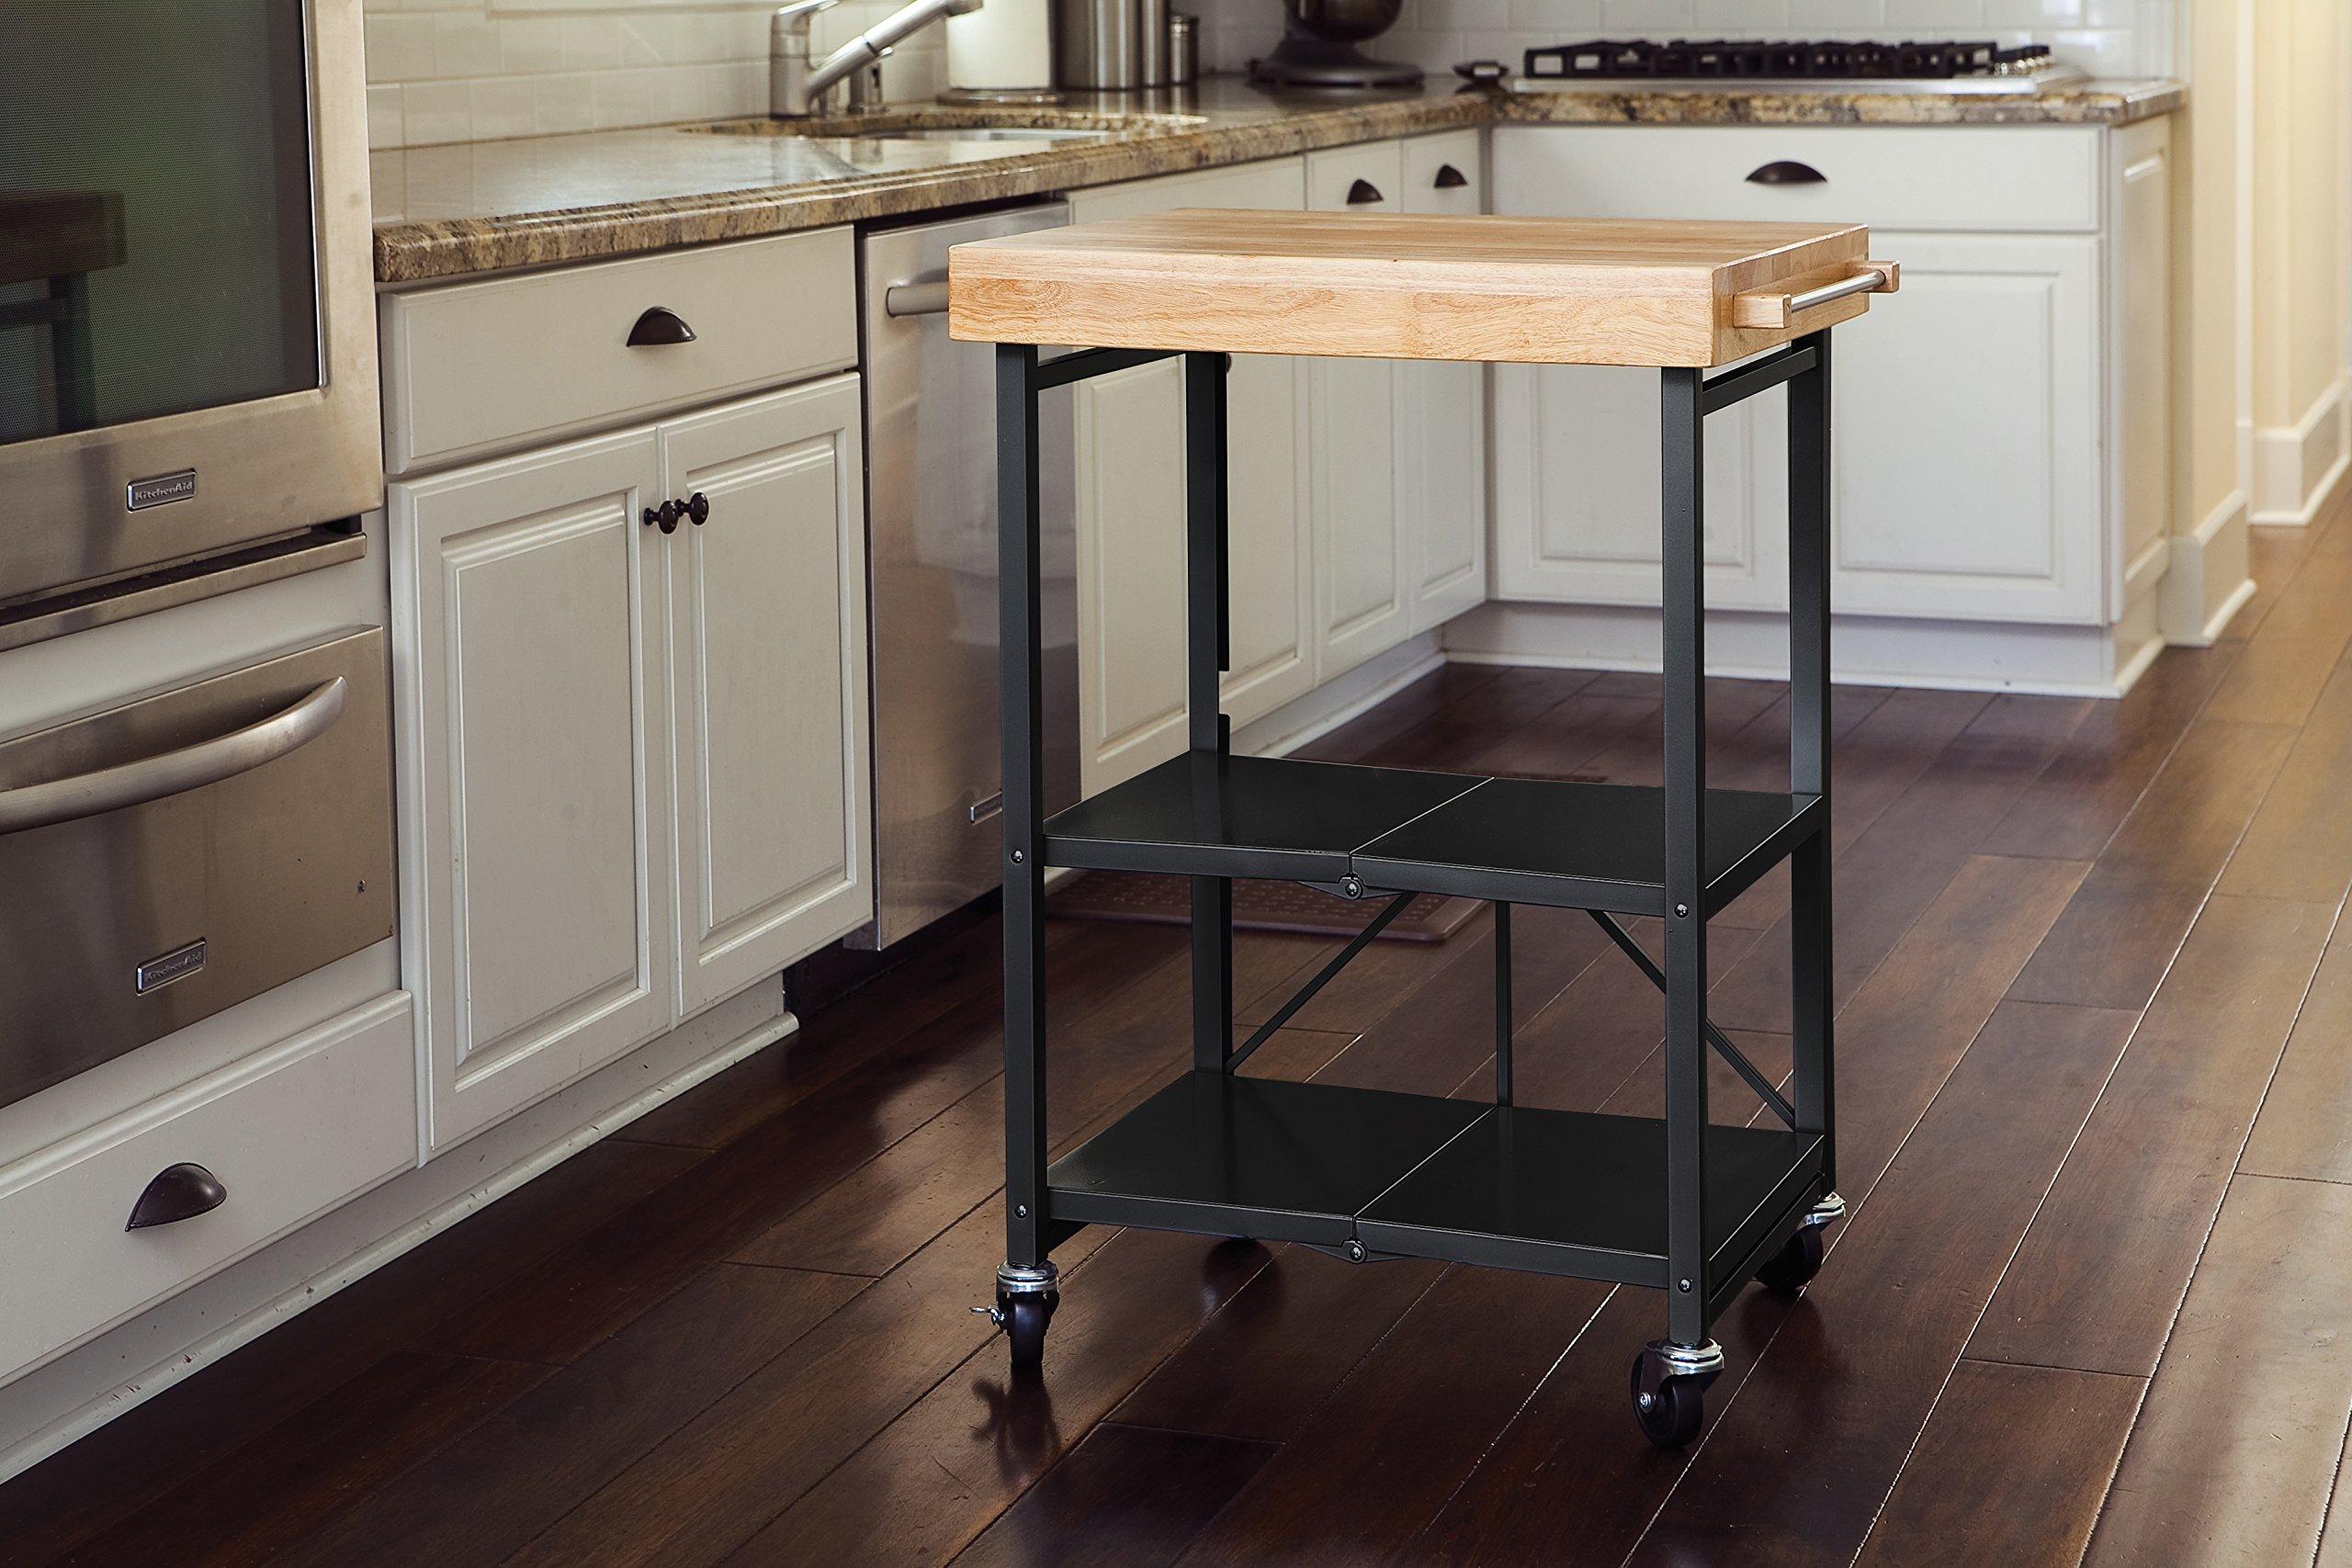 portable rolling cafe cart foldable kitchen island counter. Black Bedroom Furniture Sets. Home Design Ideas